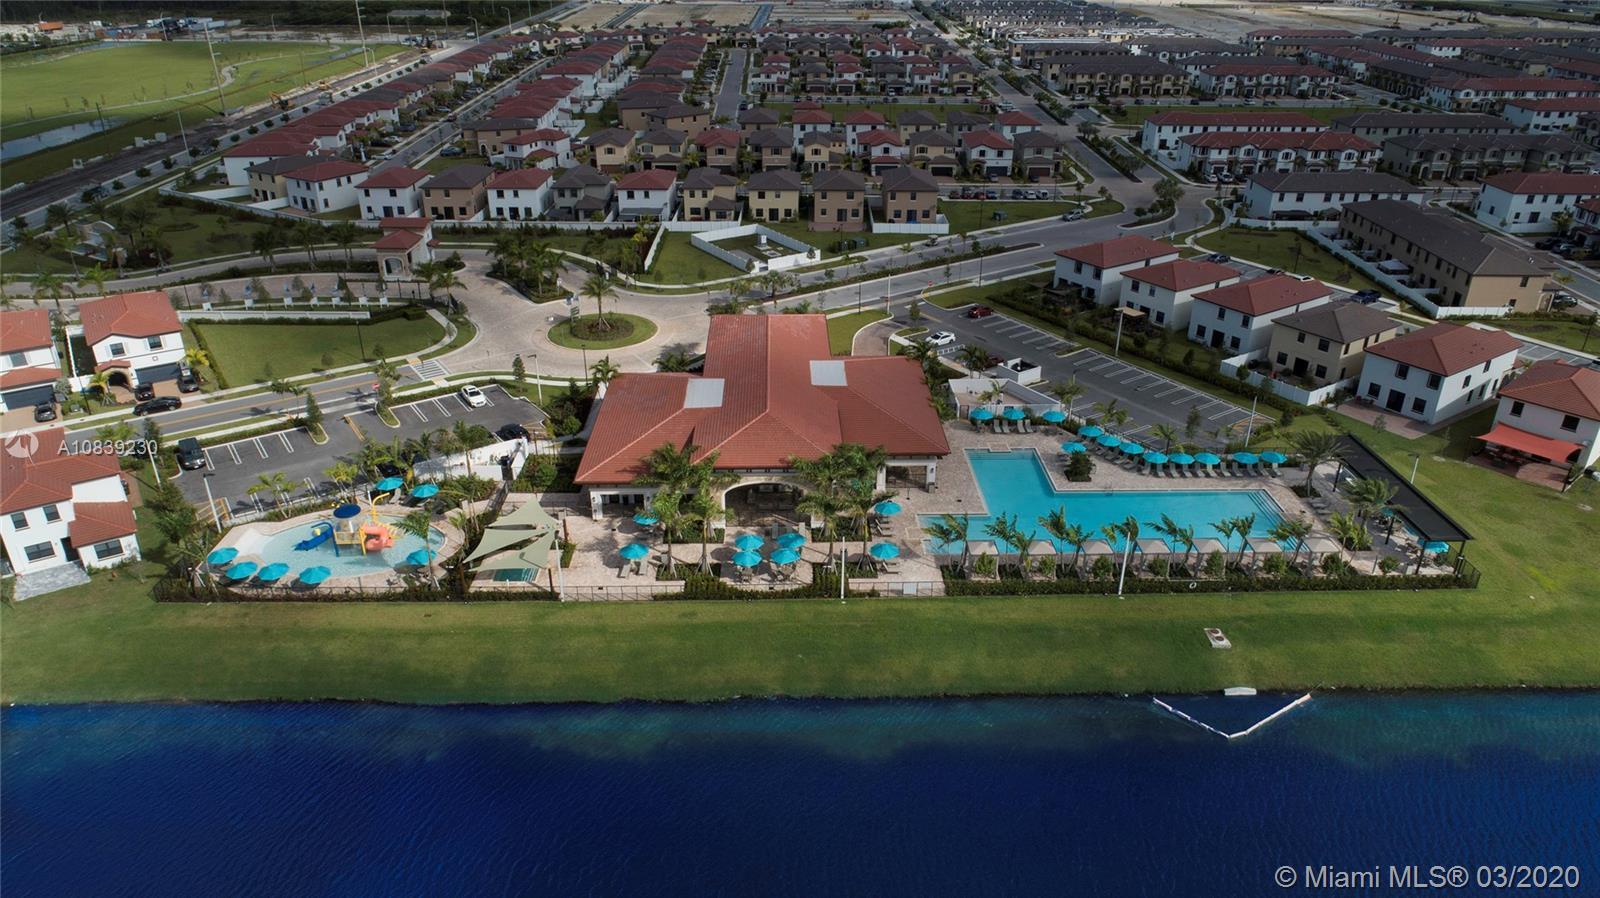 3423 W 106 TERR # 0, Hialeah Gardens, Florida 33018, 3 Bedrooms Bedrooms, 1 Room Rooms,3 BathroomsBathrooms,Residential,For Sale,3423 W 106 TERR # 0,A10839230